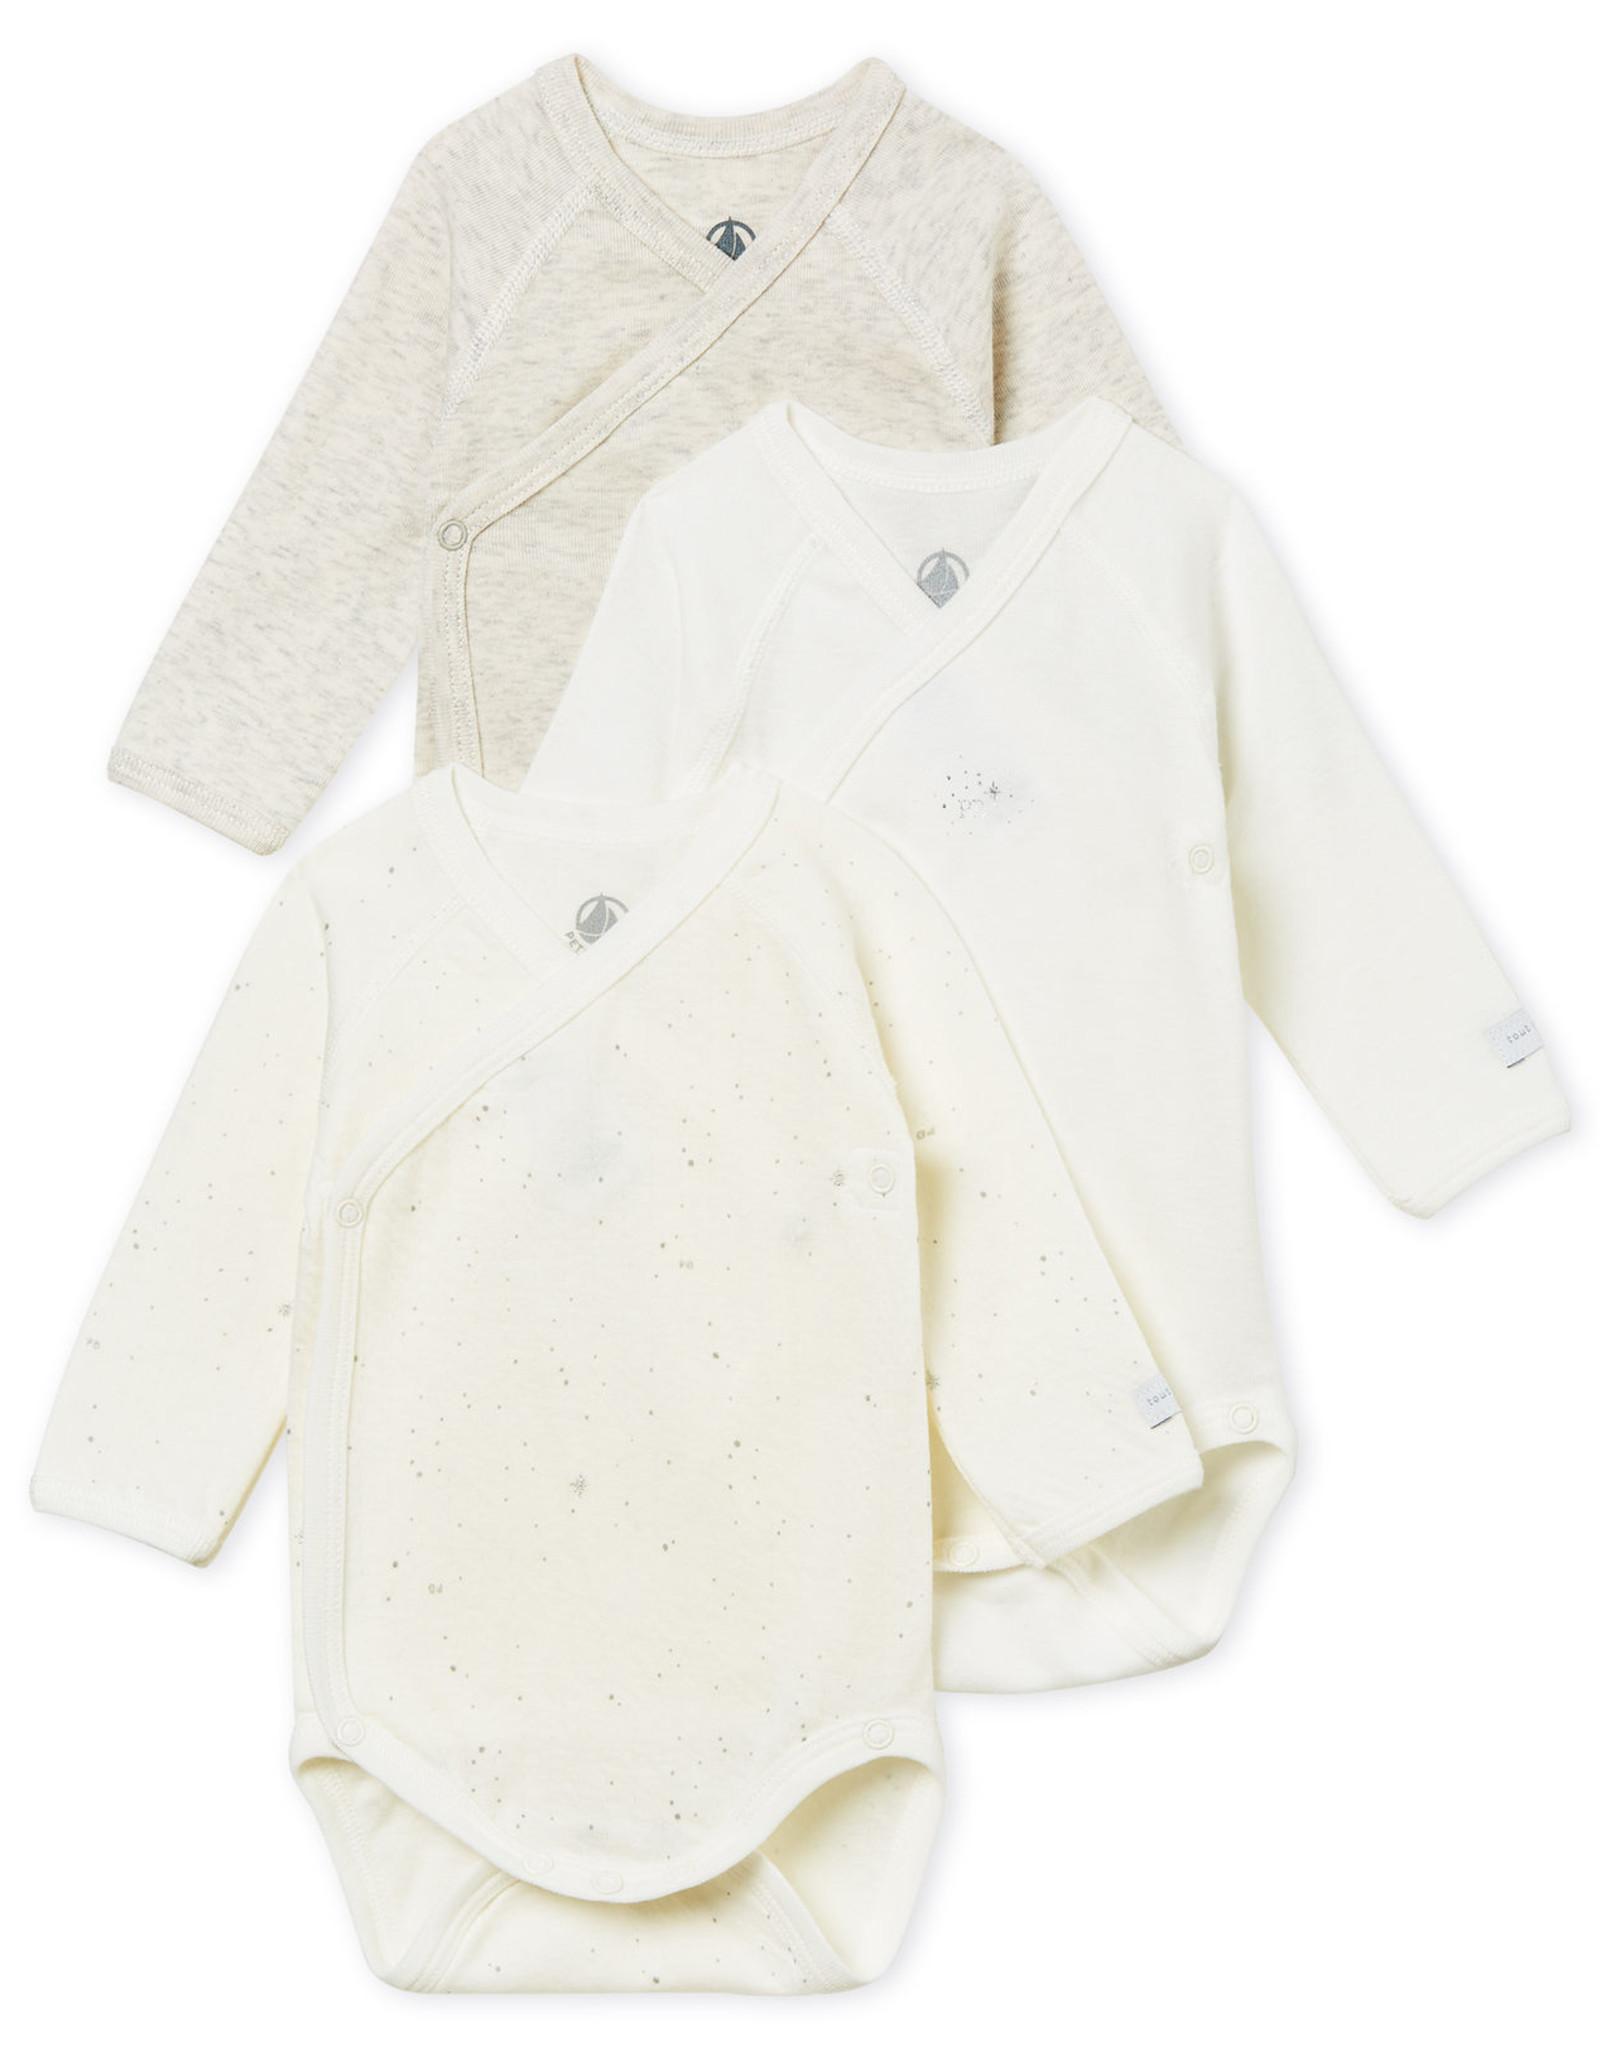 Petit Bateau Set of 3 baby bodysuit